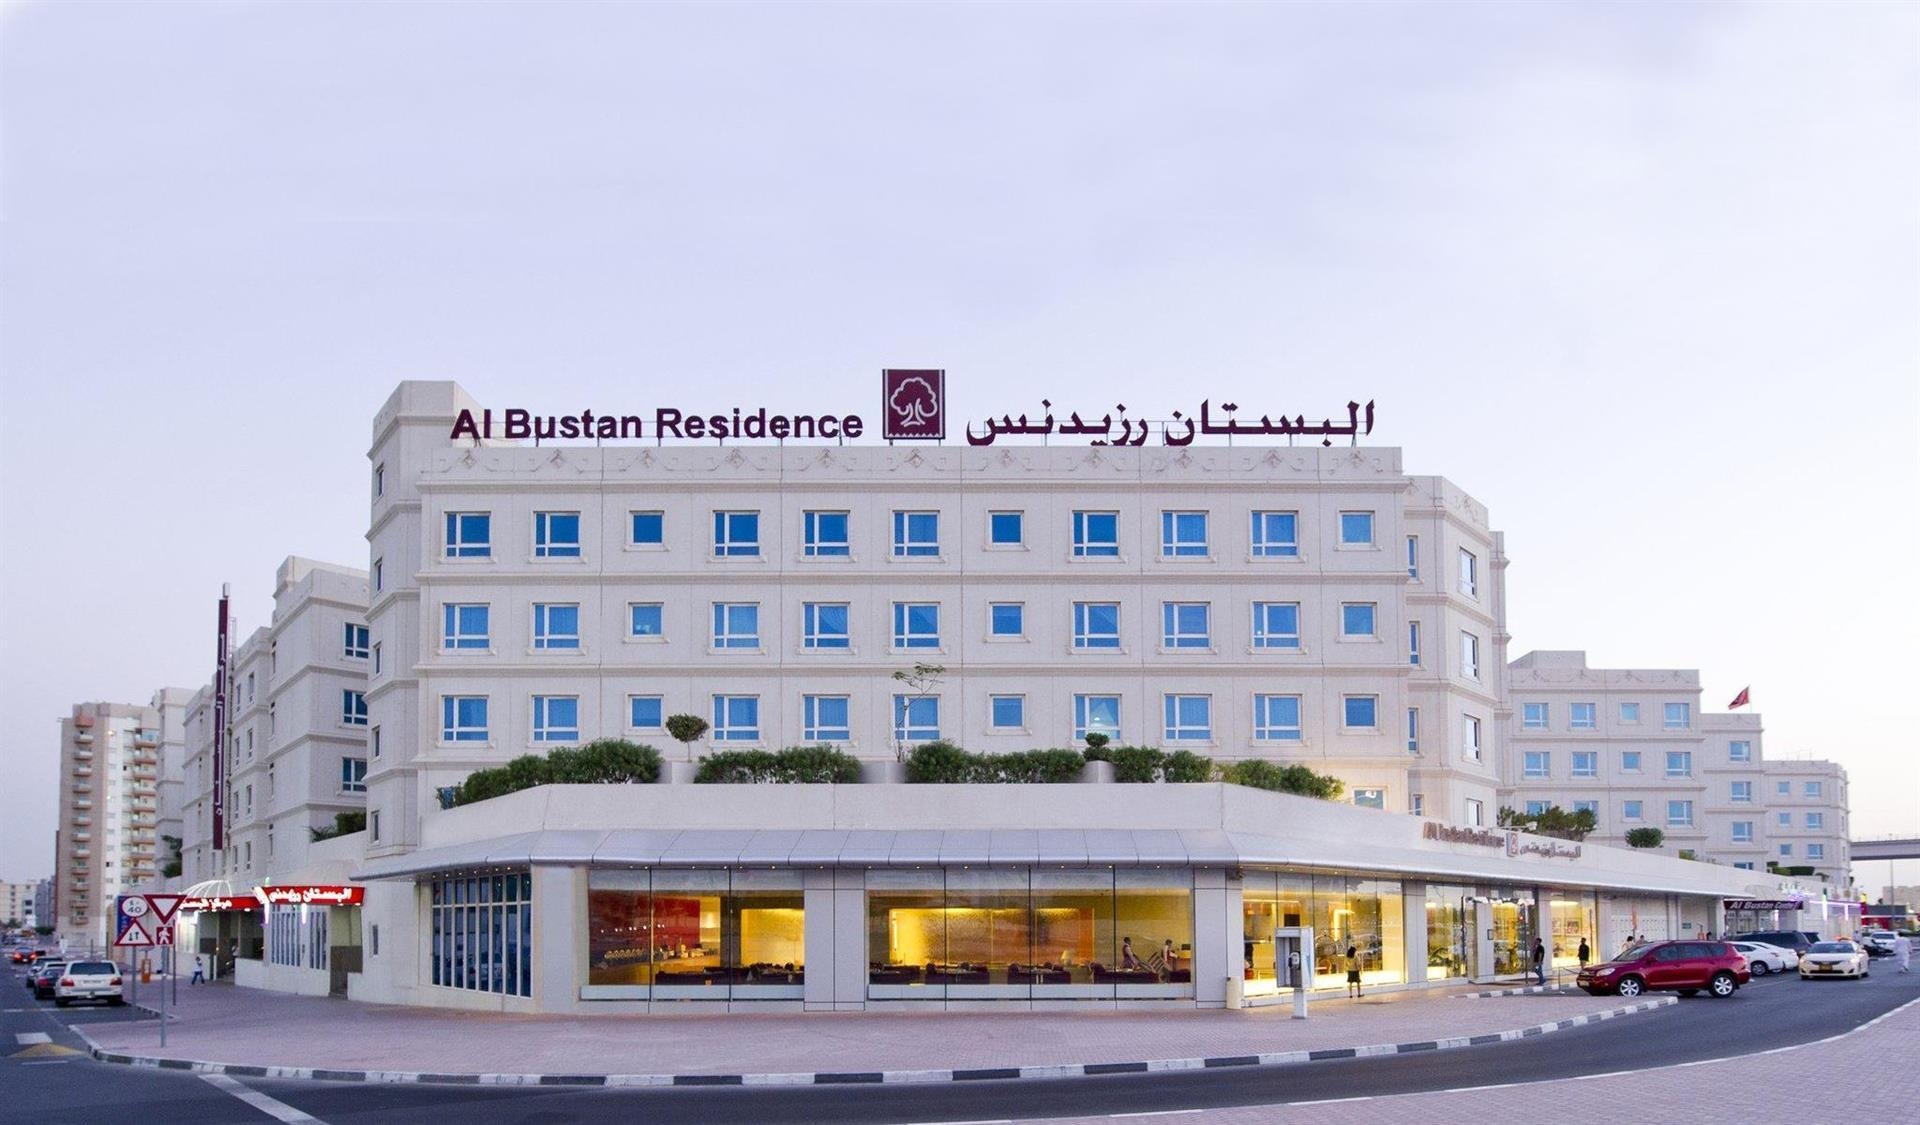 Отель Al Bustan Centre & Residence, Дубай, ОАЭ